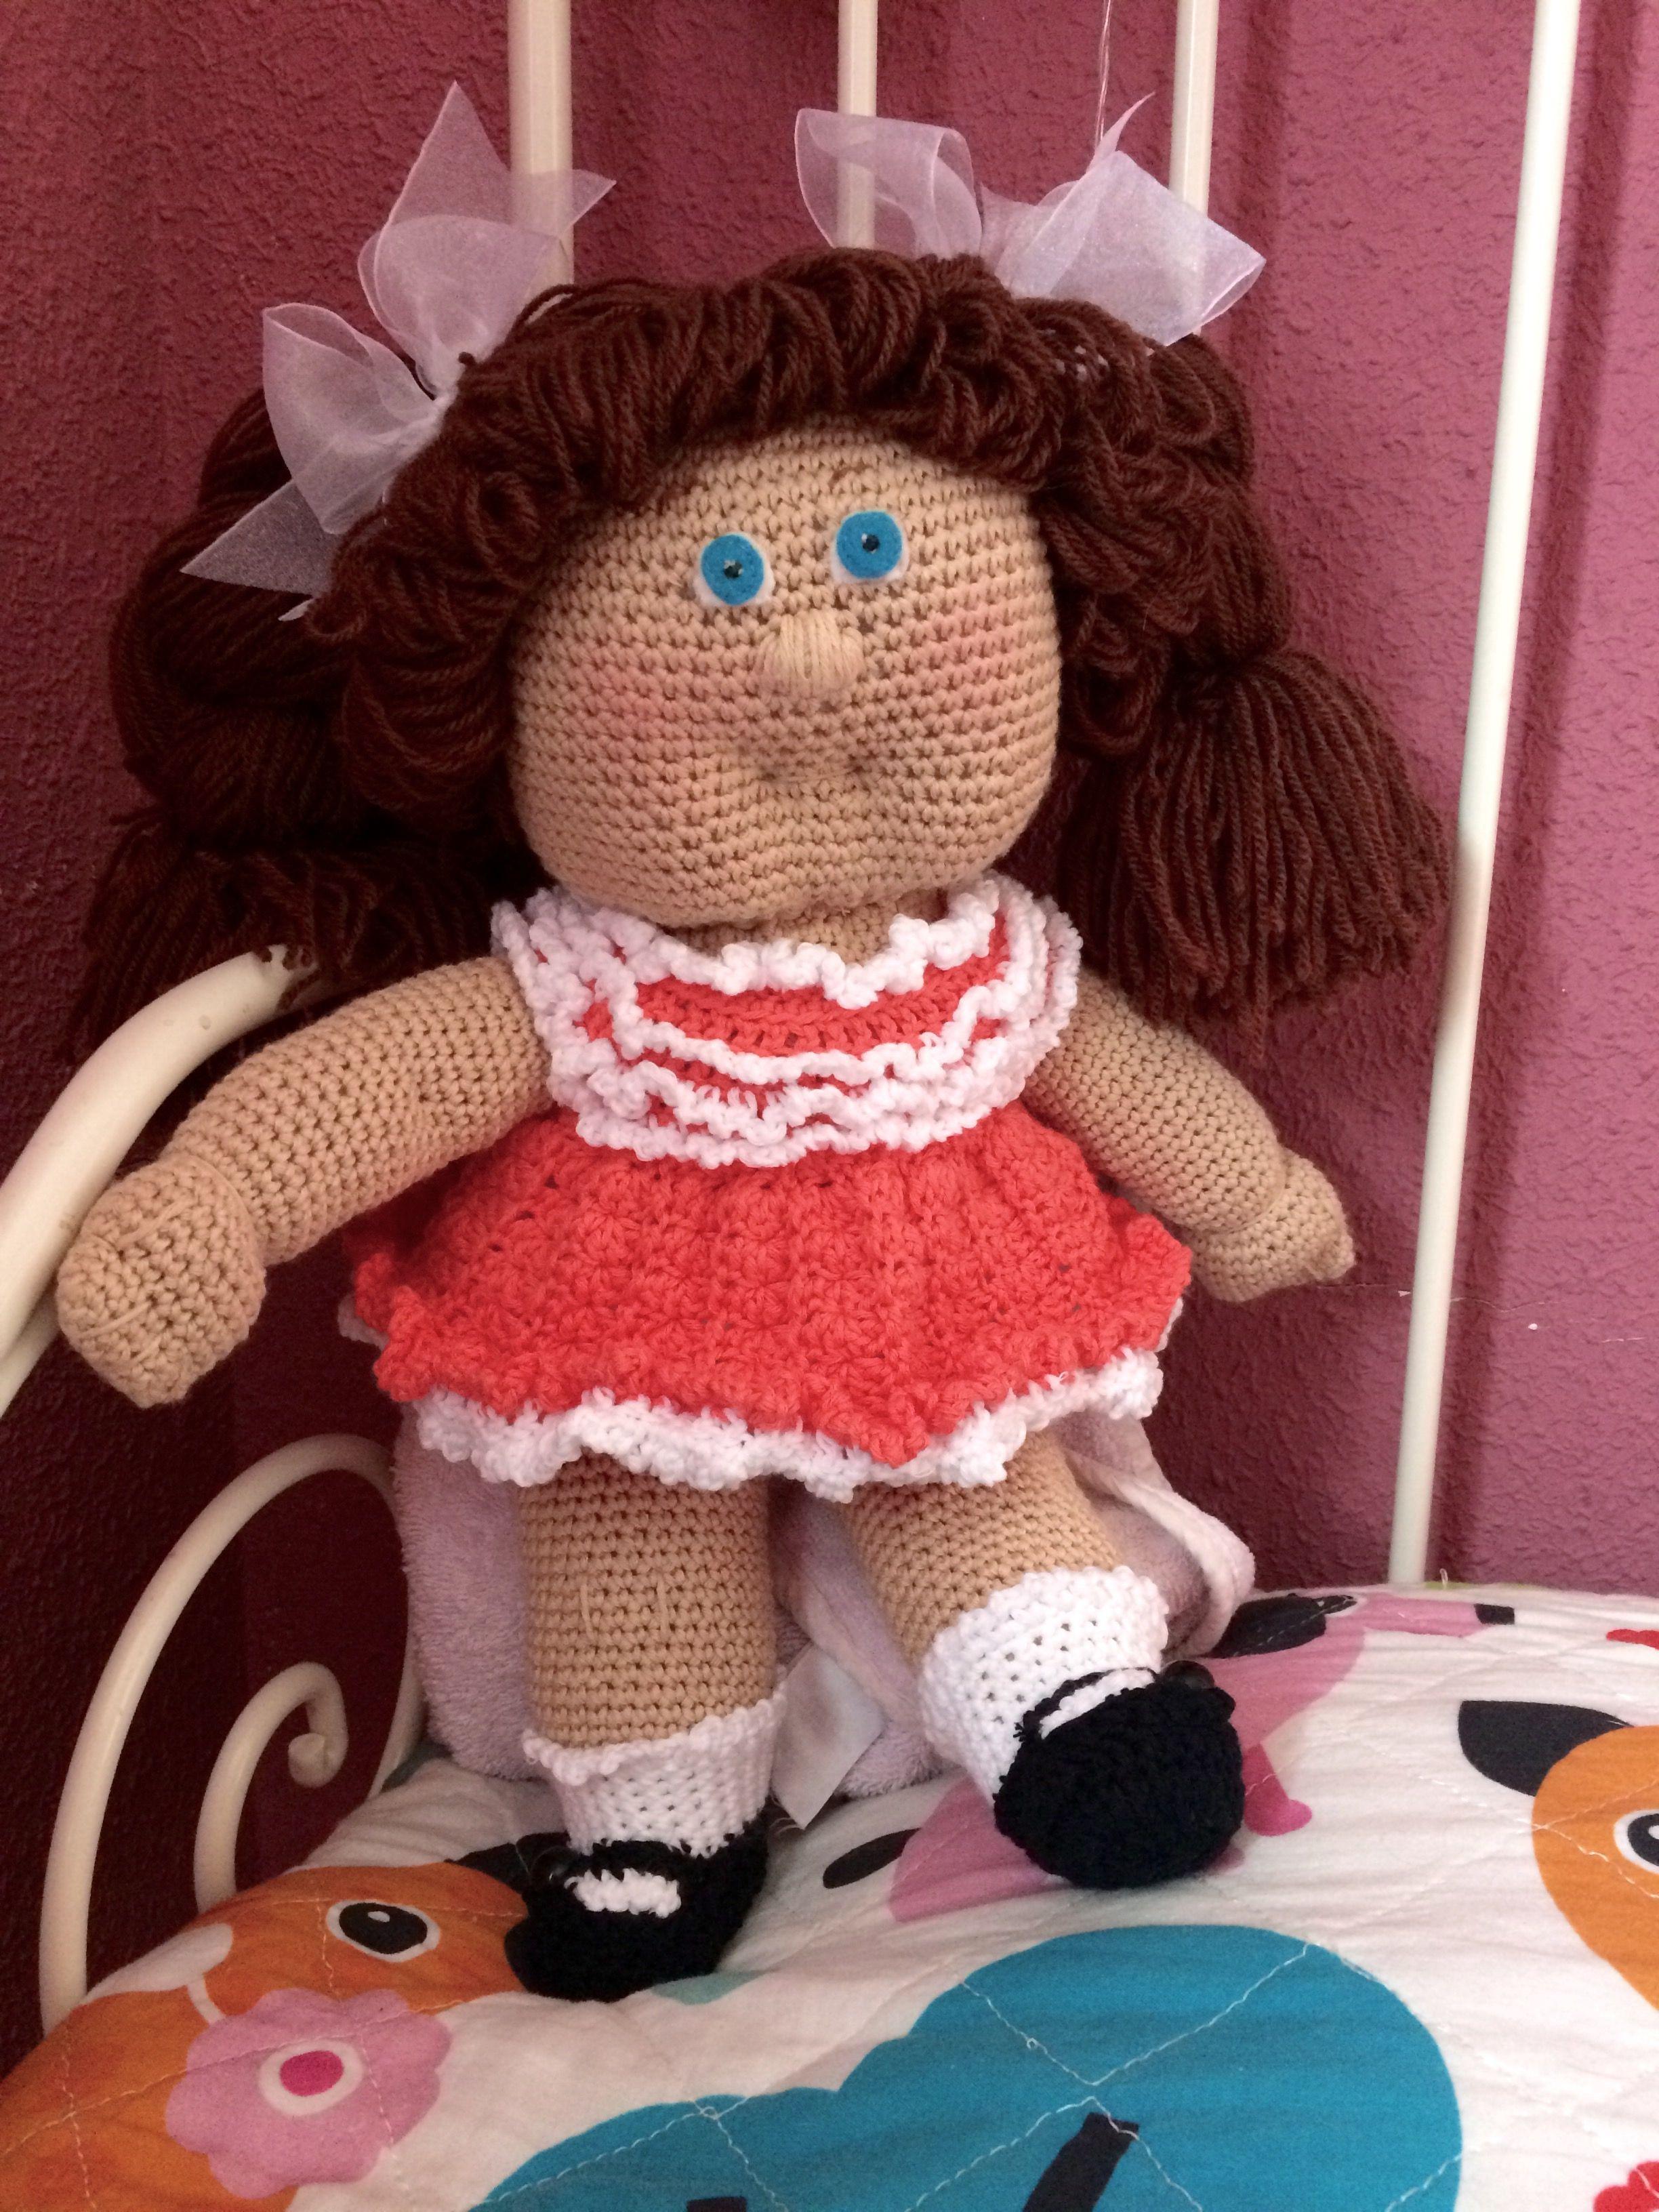 Cabbage patch kids doll crochet amigurumi